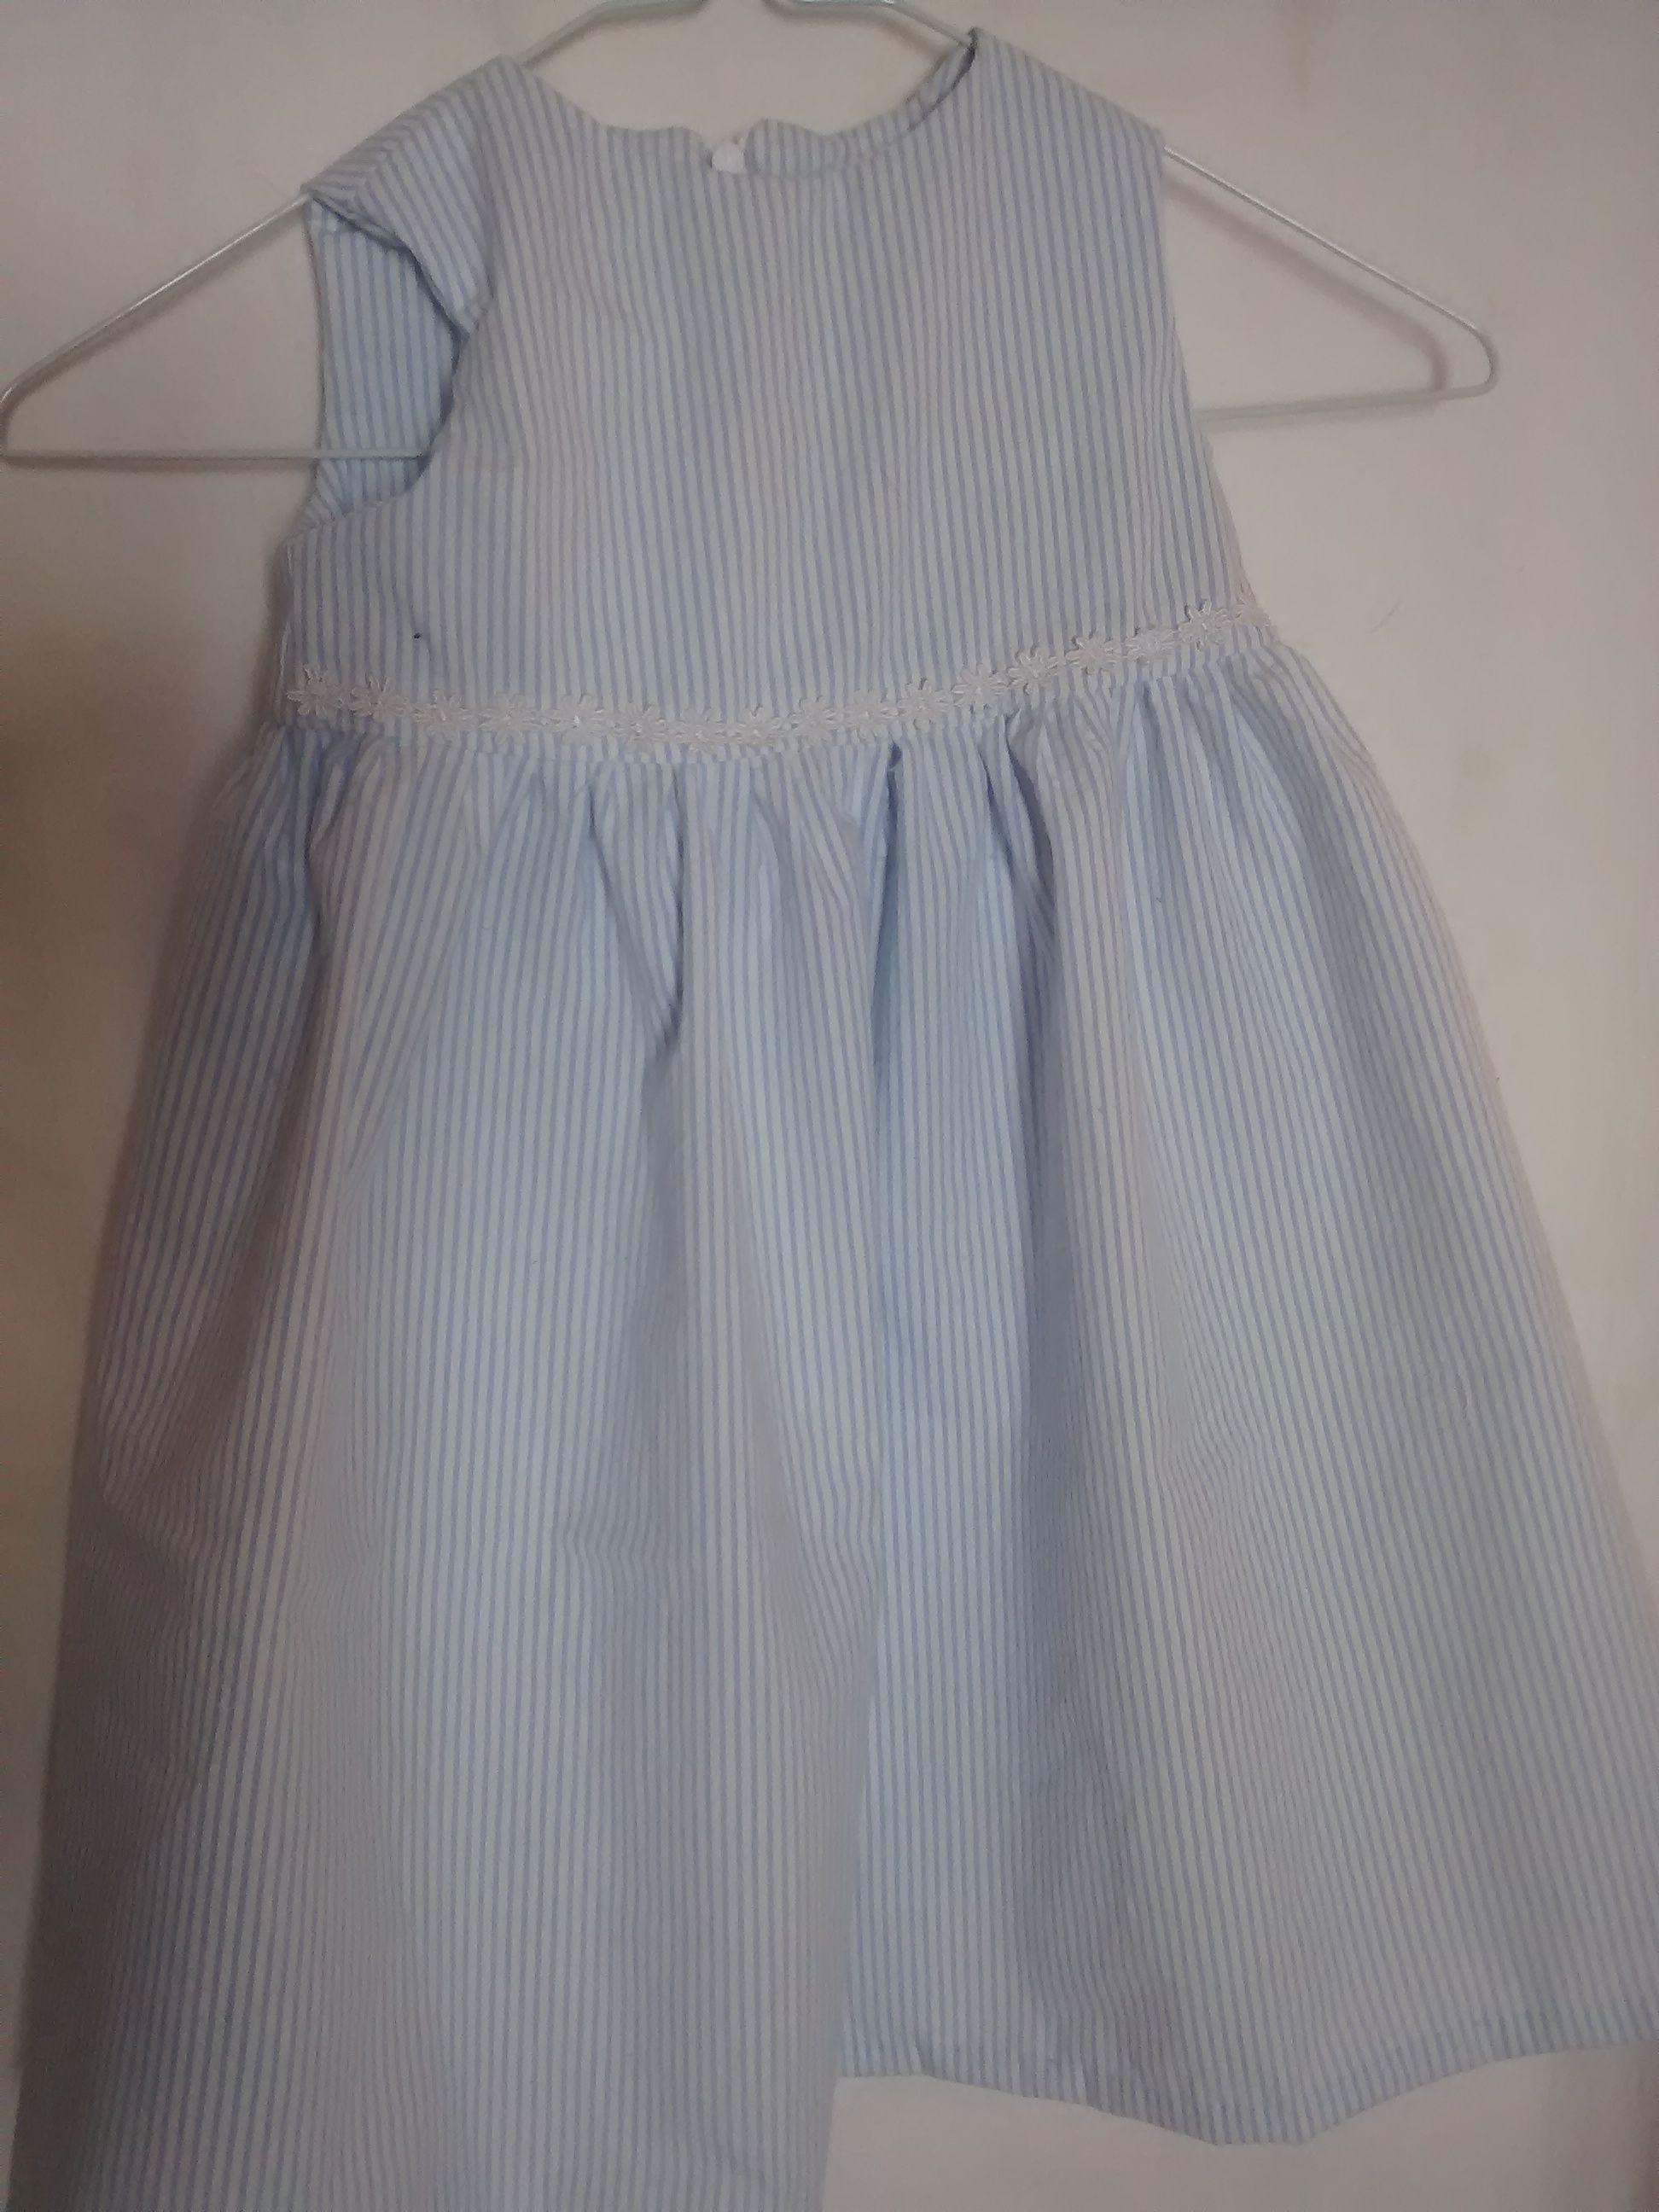 10393aa2552795 Fluffy Cloud  Blue   white stripped seersucker cotton Baby L   Toddler S  Sleeveless